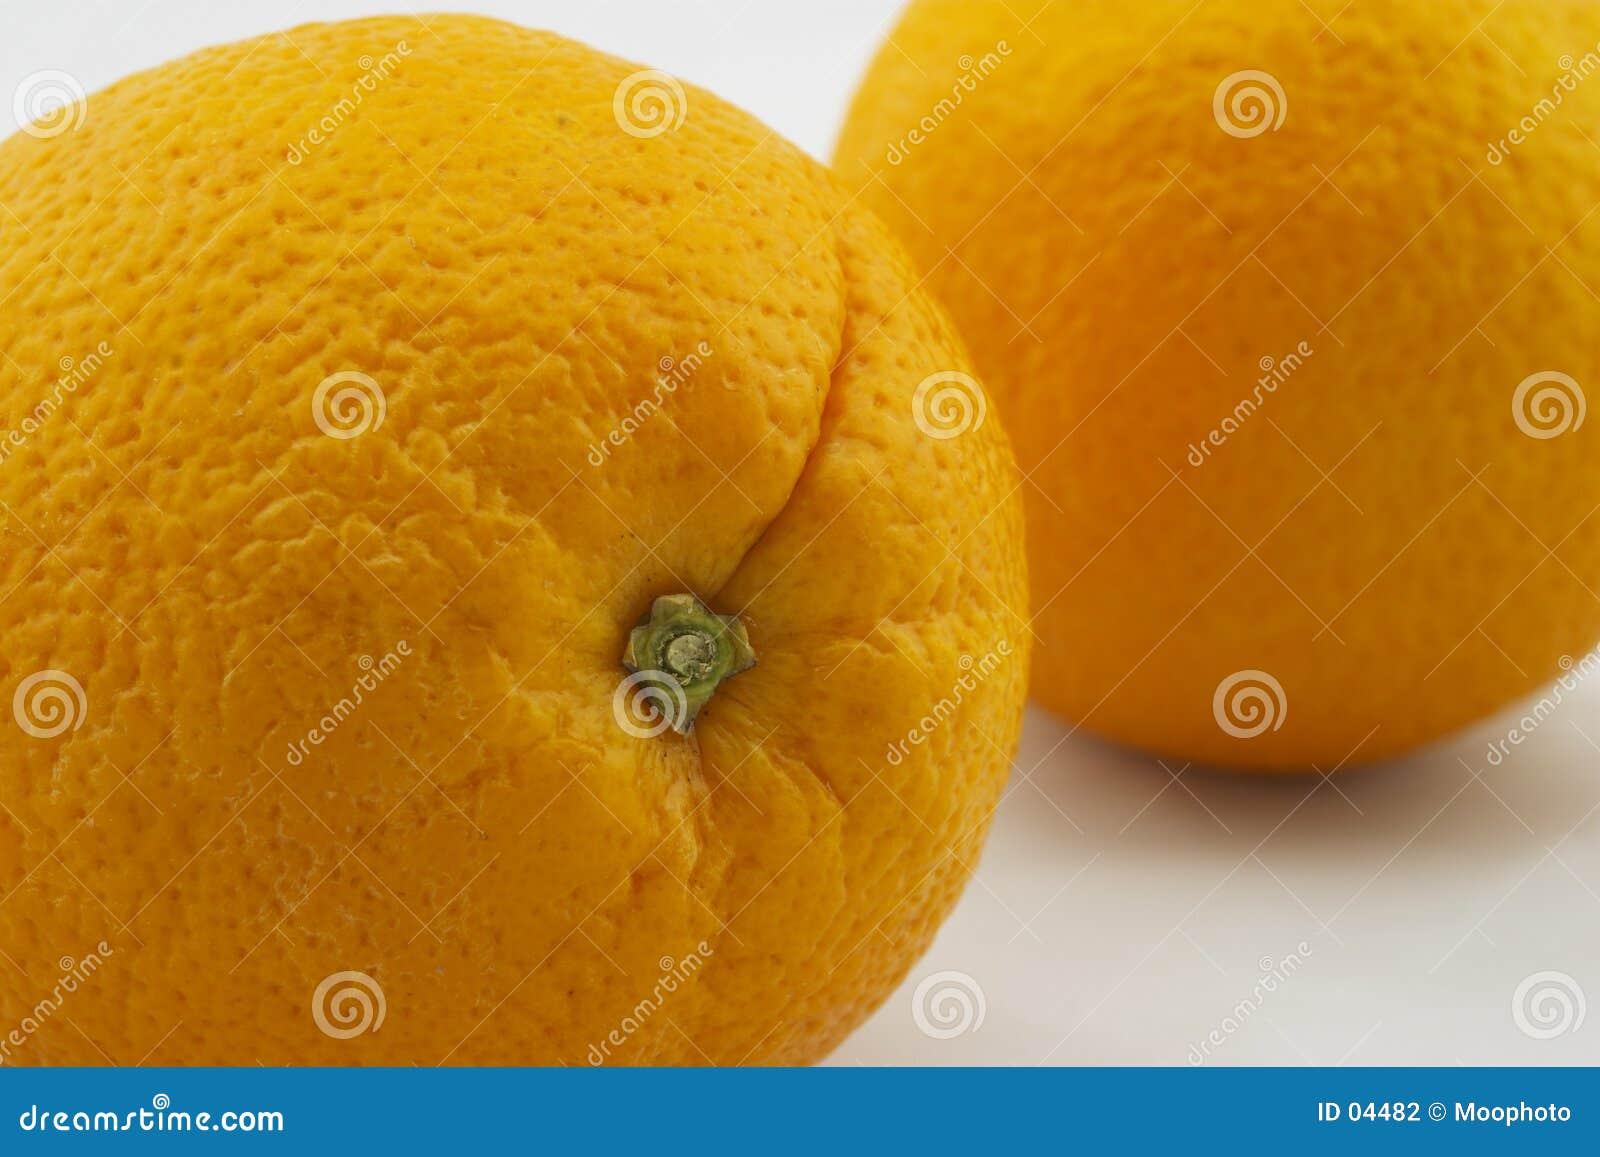 Two Oranges, closeup stem dimples